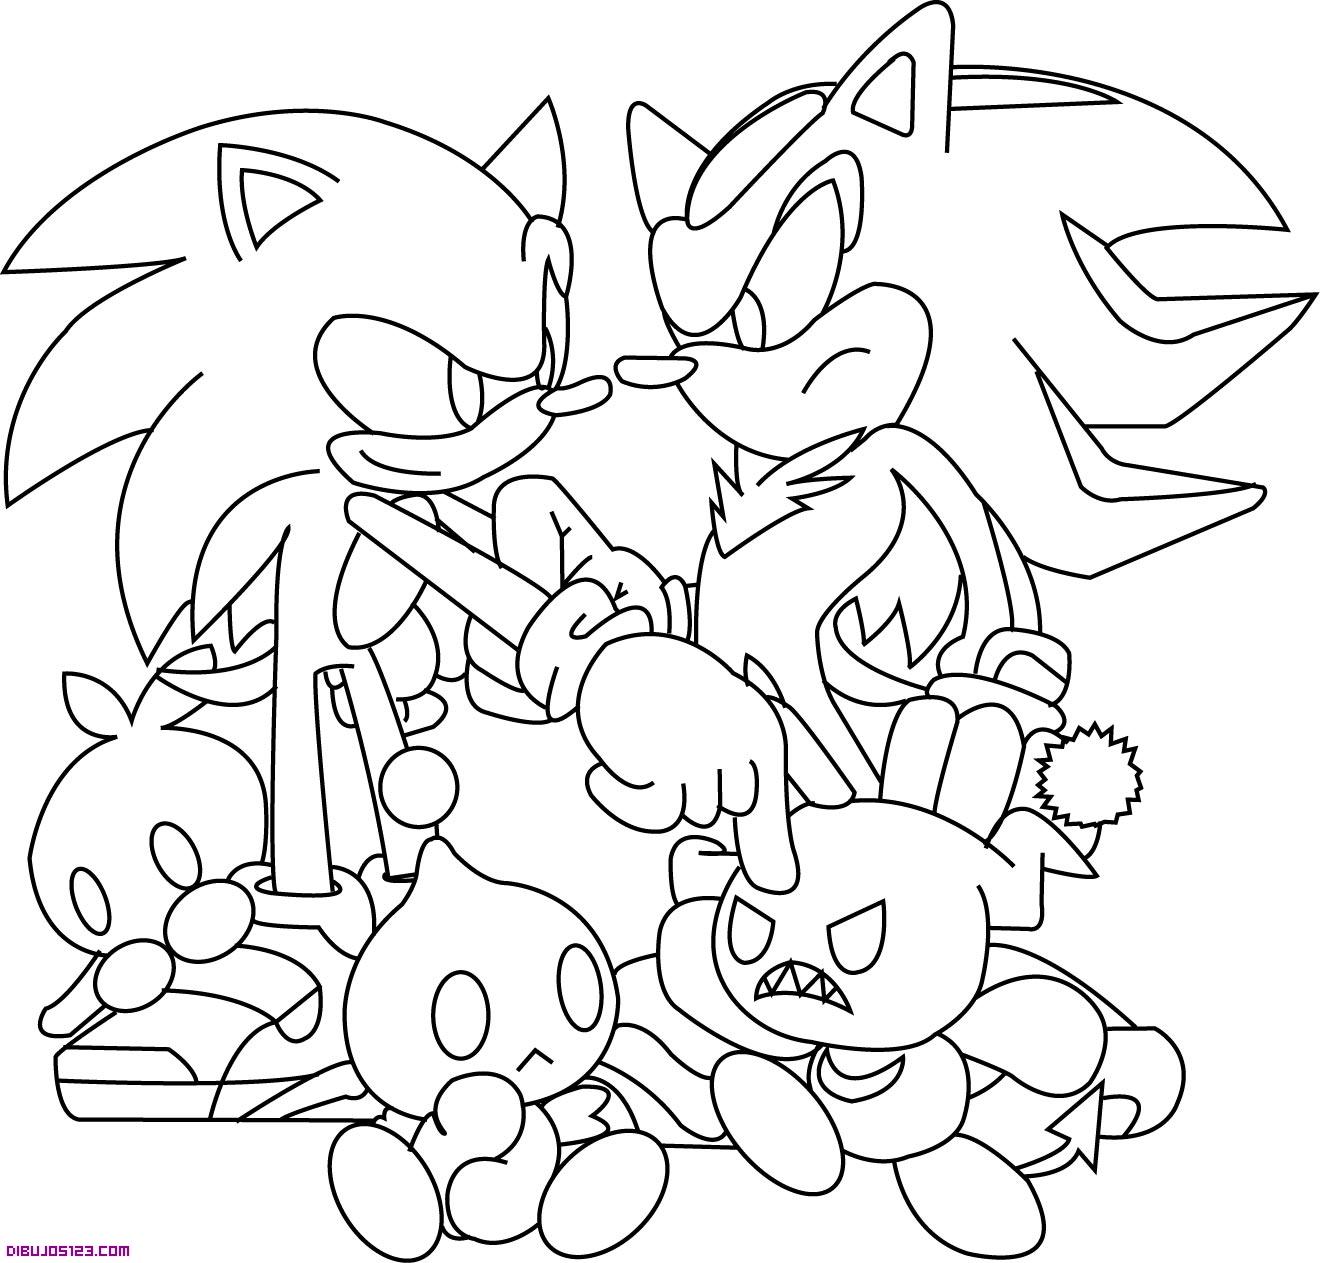 Sonic y personajes